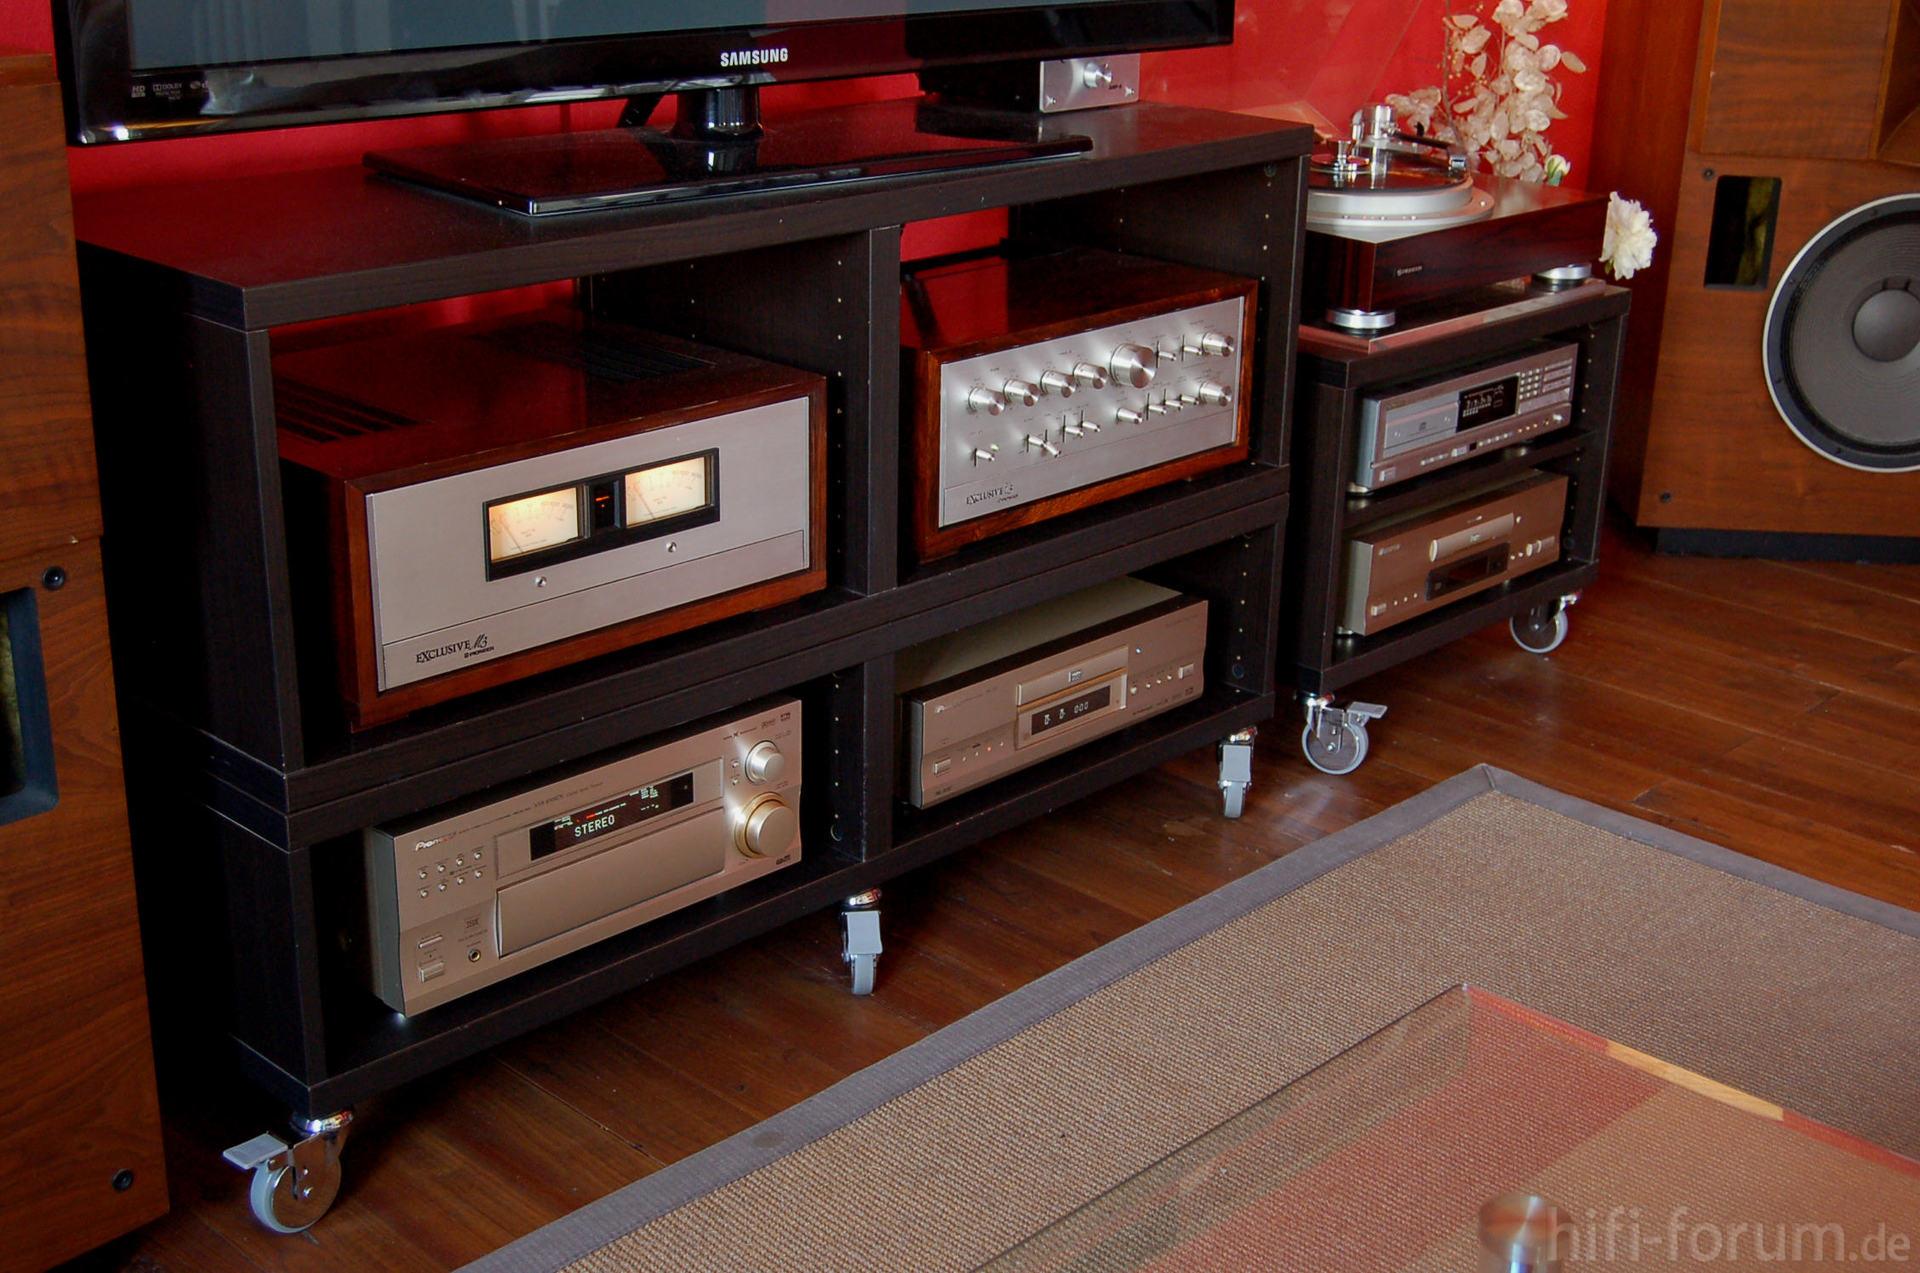 m 3 c3 004 hifiklassiker m3c3 stereo hifi bildergalerie. Black Bedroom Furniture Sets. Home Design Ideas